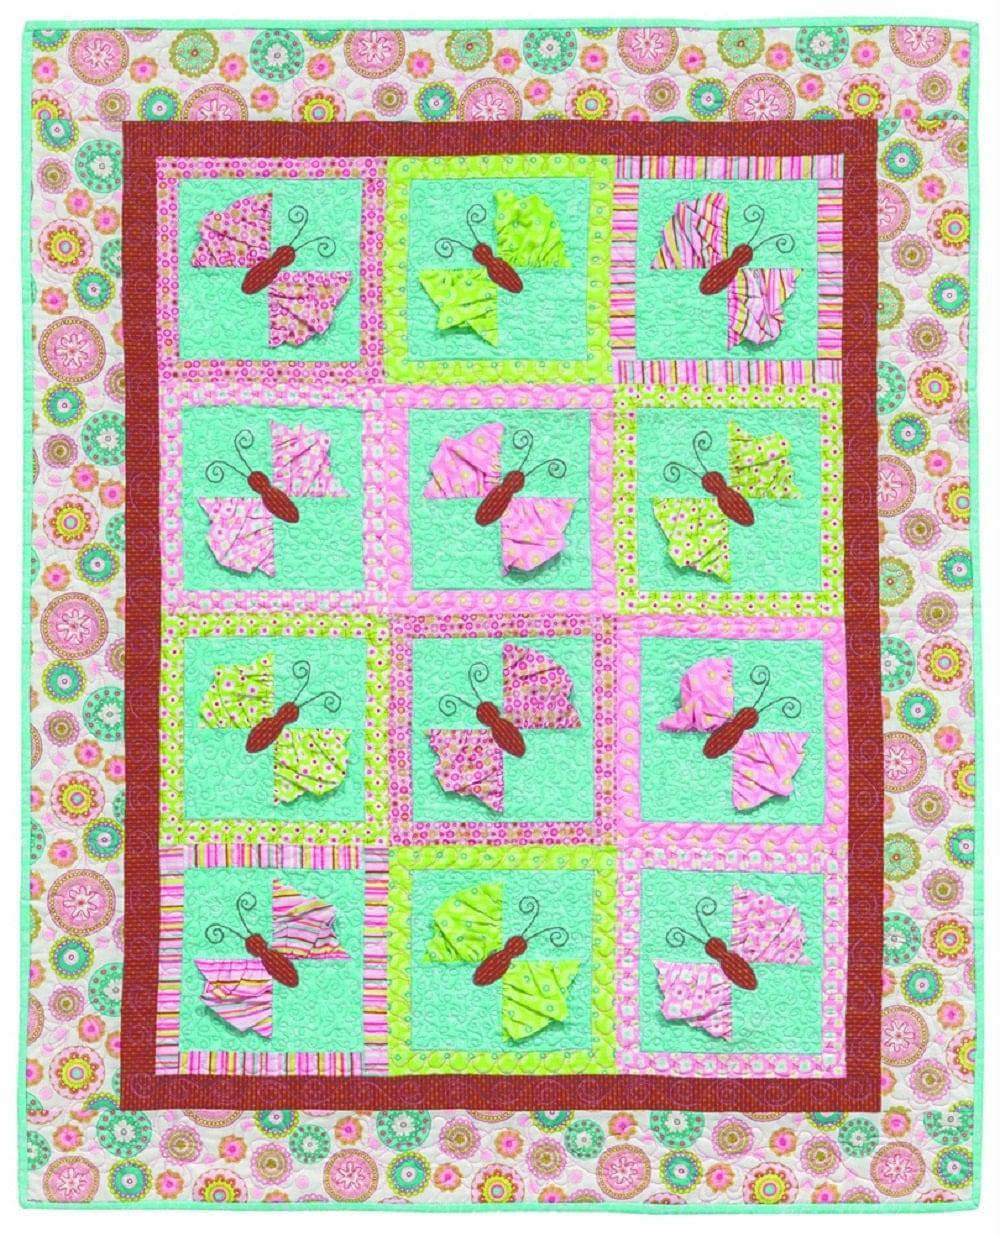 Quilt Book Sale Kristin Roylance *Holiday Gift *Baby Shower *Birthday Gift Applique Butterflies